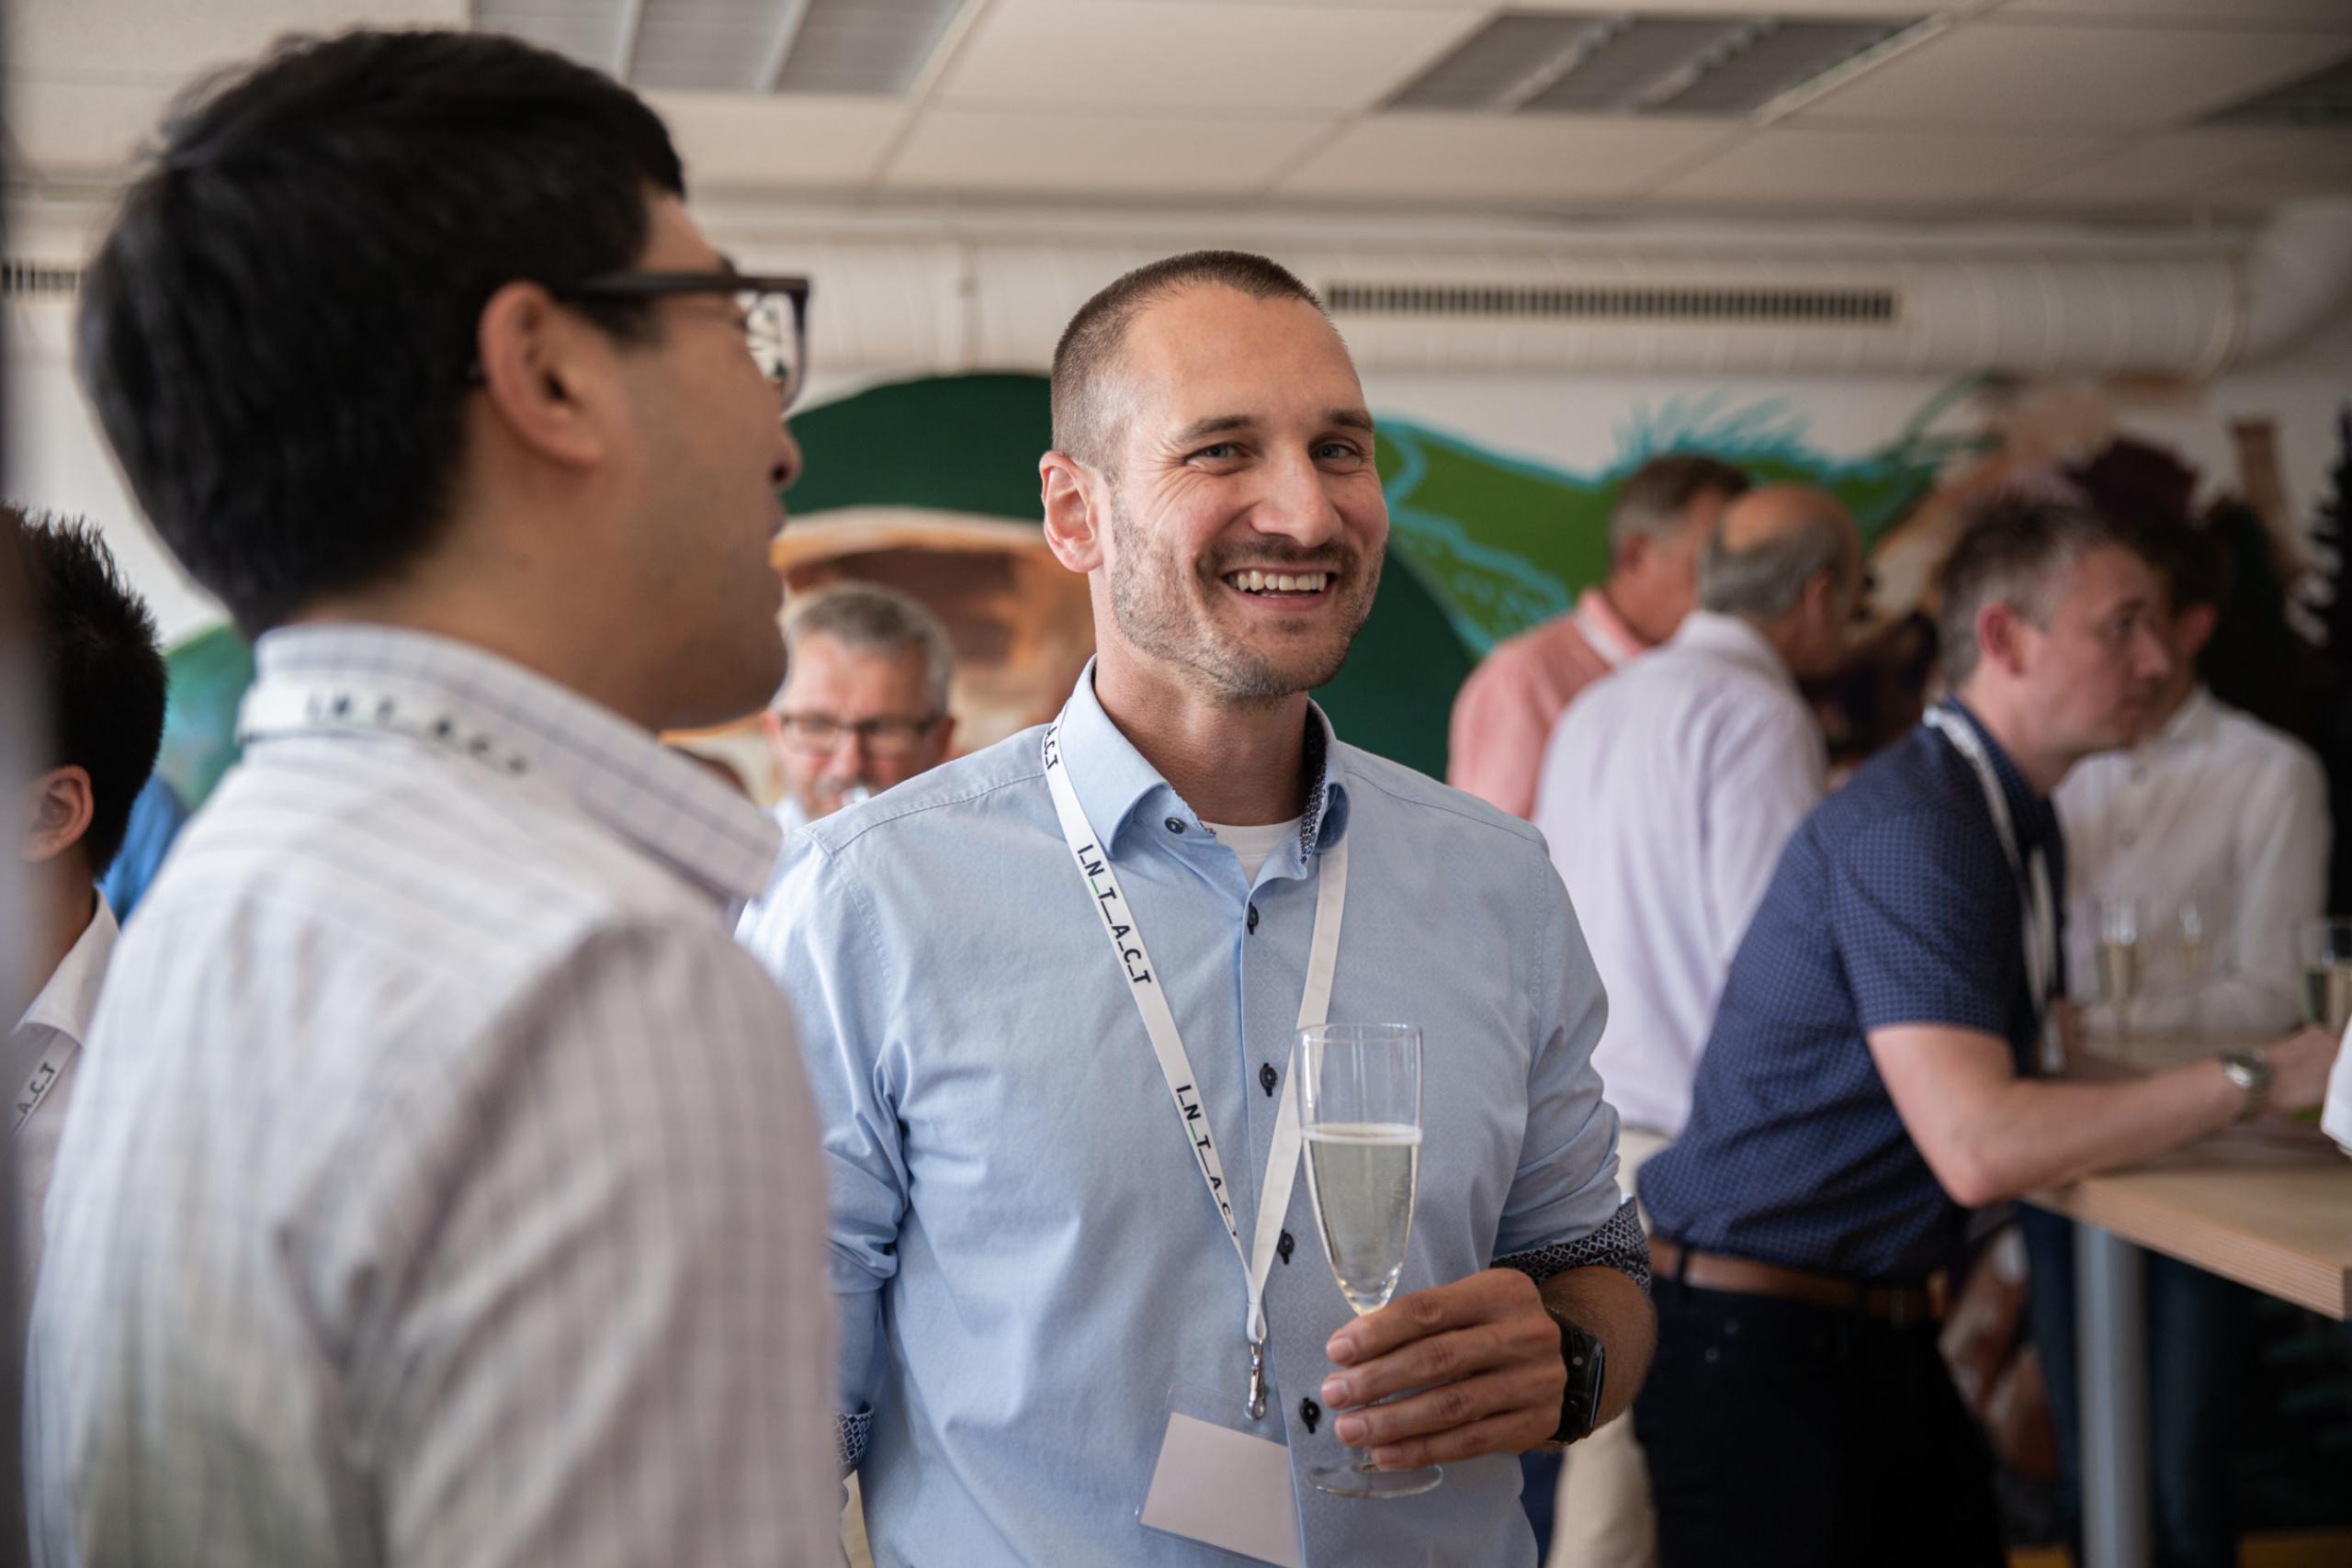 Intact Summit 2019 in Graz - Rudi Rauch, Head of Development at Intact